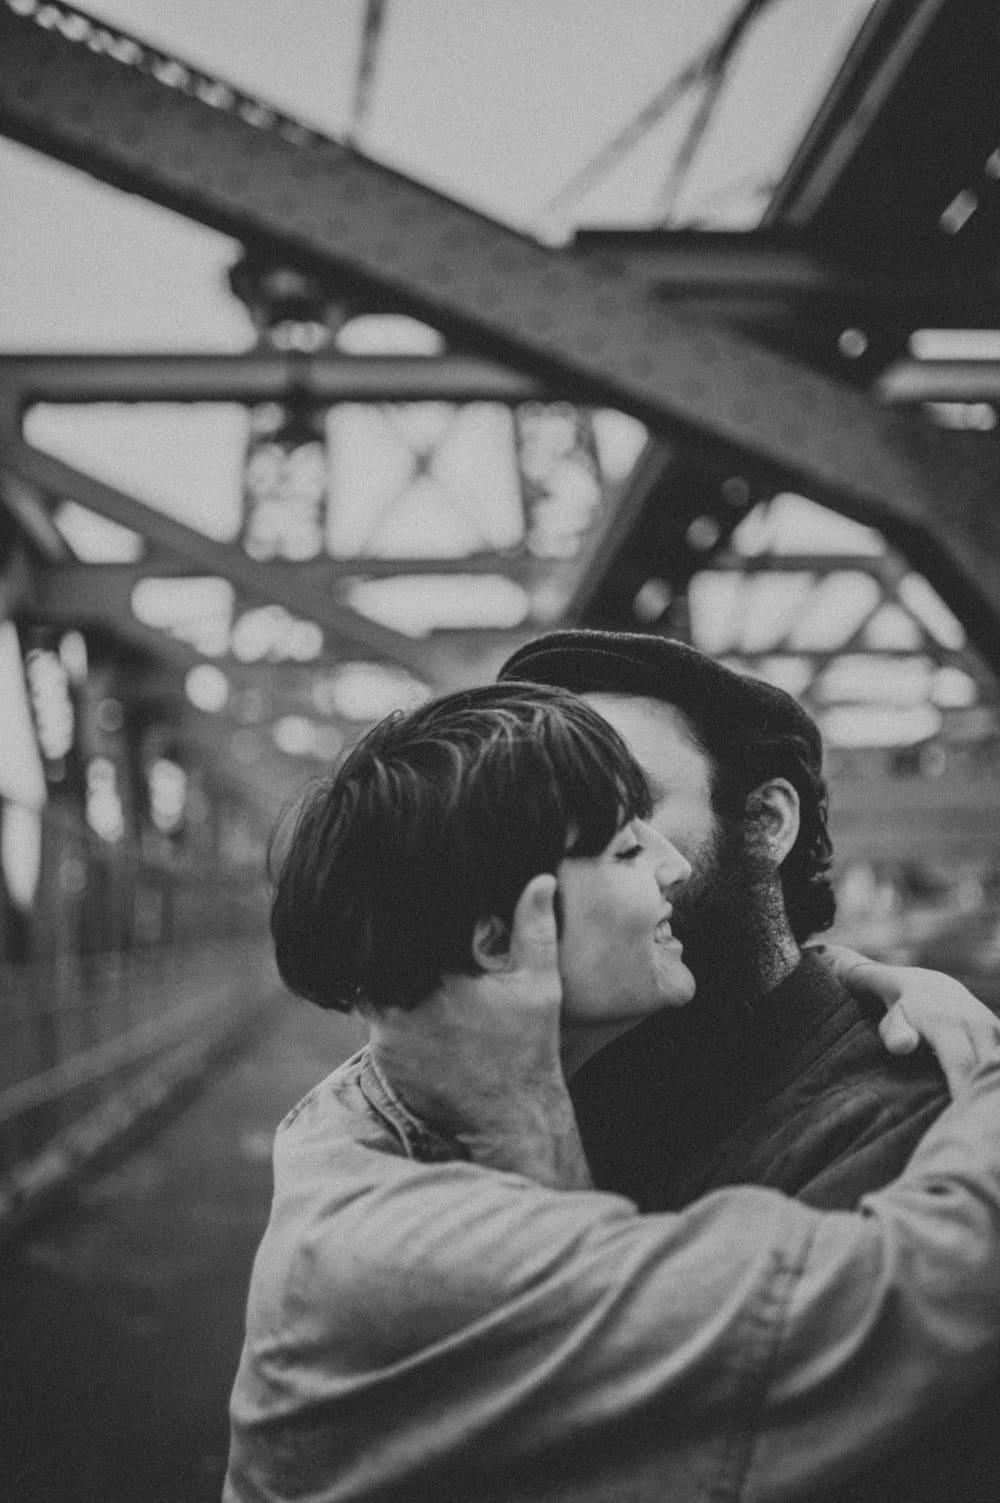 melanie-bultez-photographe-mariage-hipster-reportage-newyork-urbain-rock-9